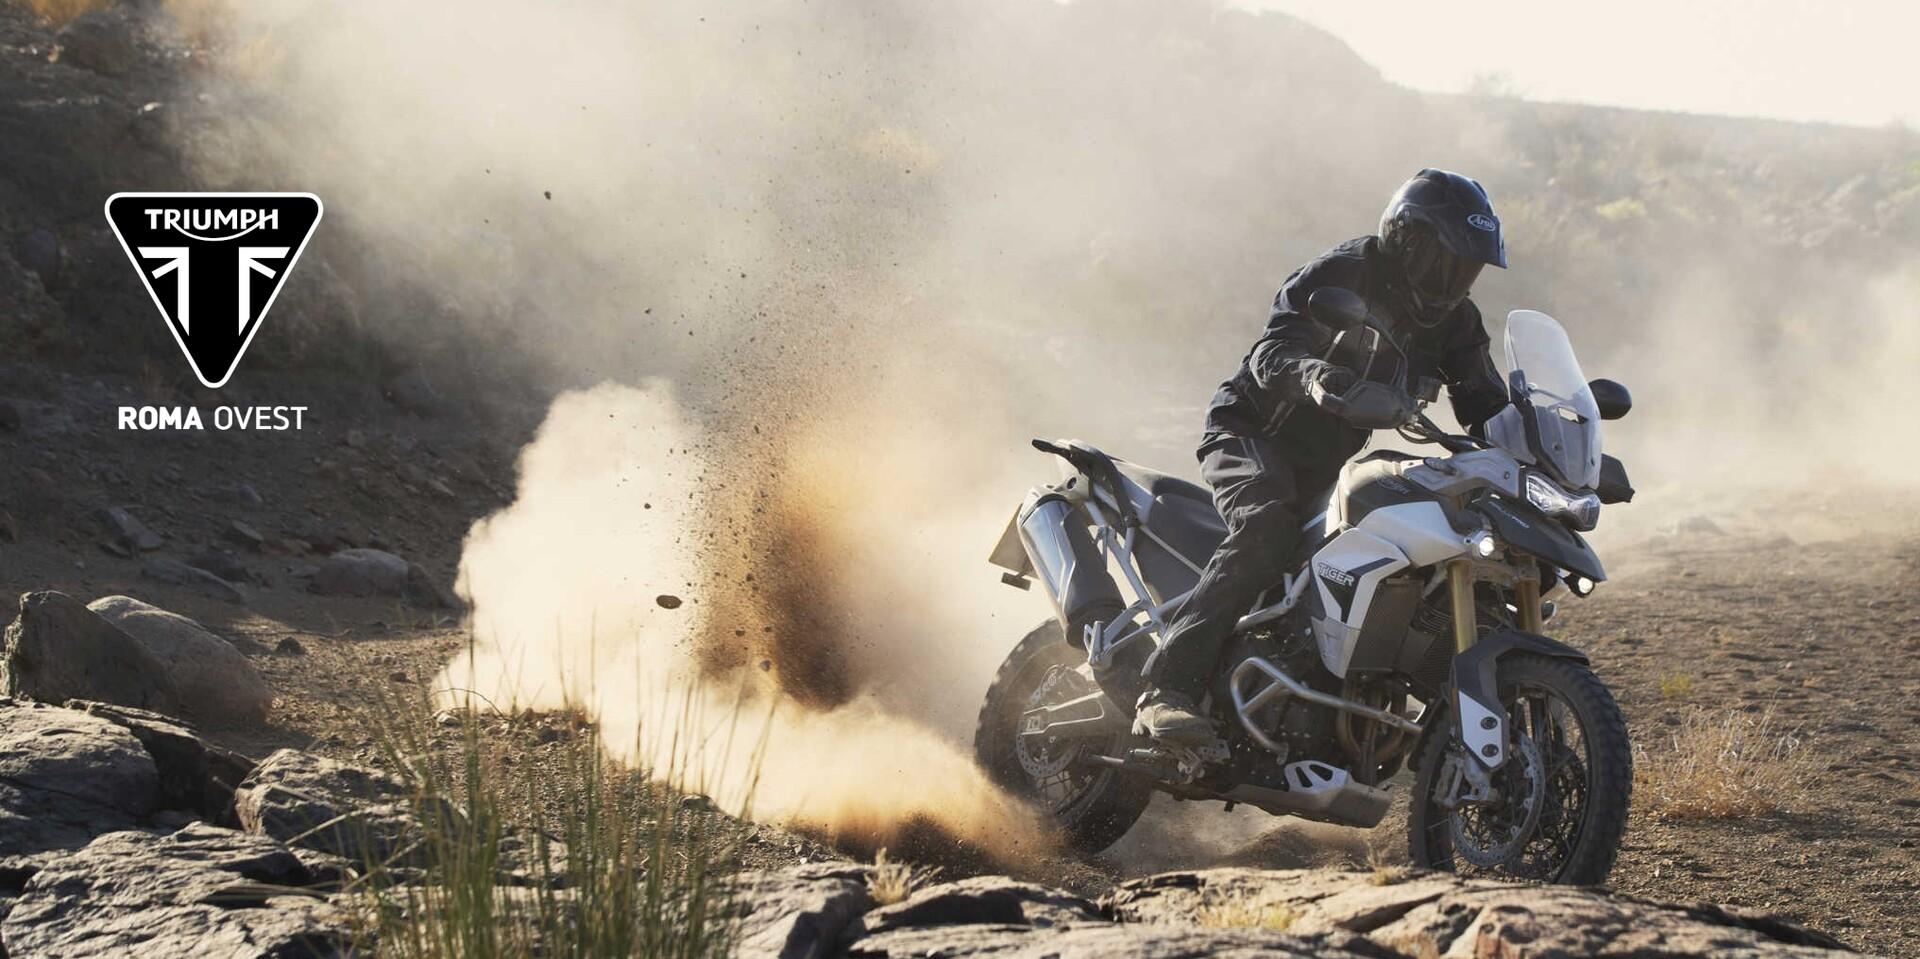 test-ride-tiger-900-rally-triumph-roma